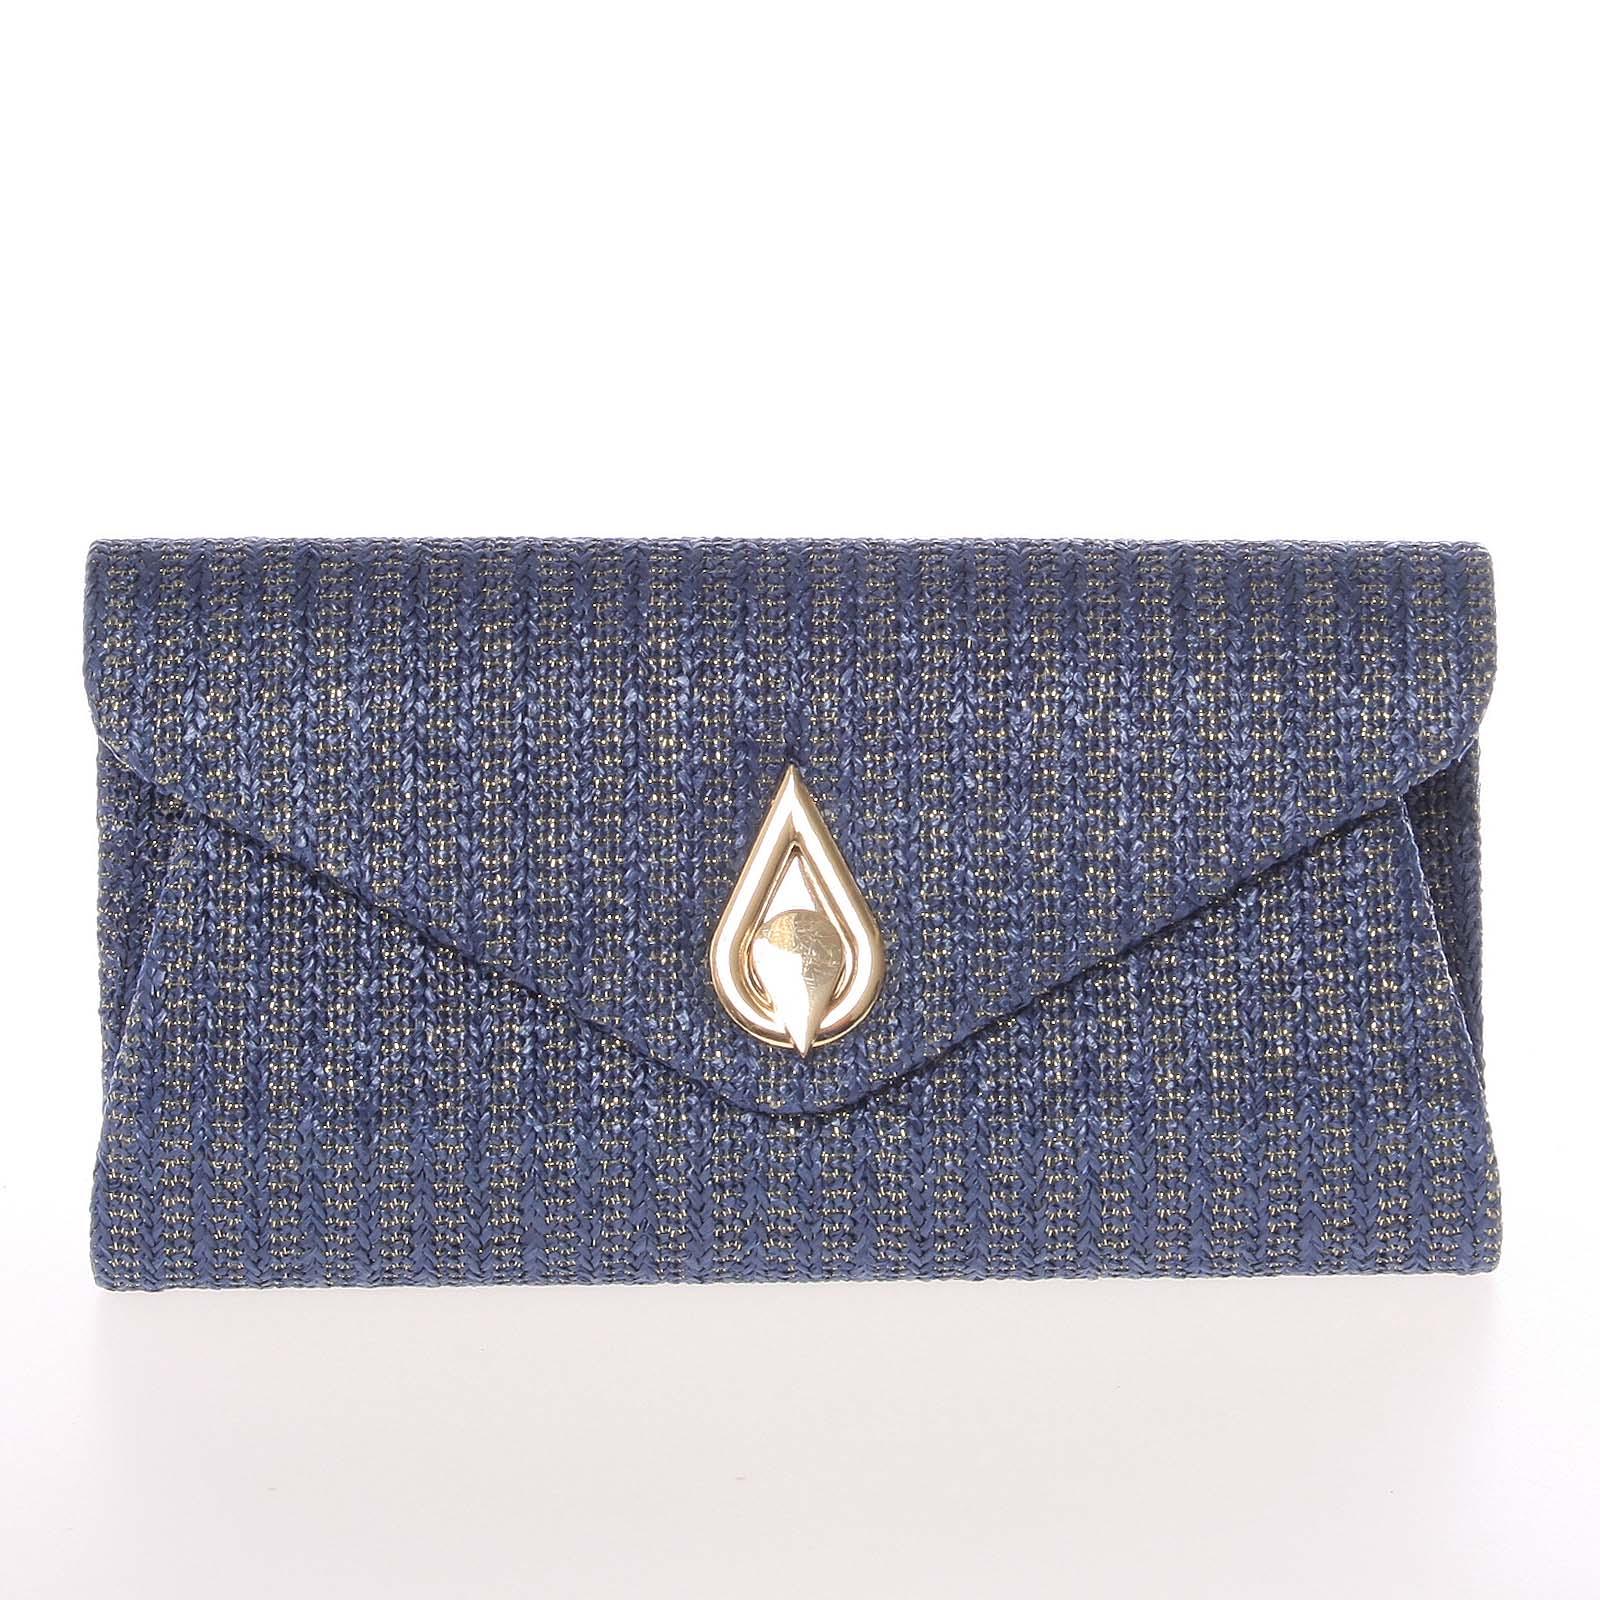 Moderná dámska preplietaná listová kabelka tmavomodrá - Delami ZL442 modrá